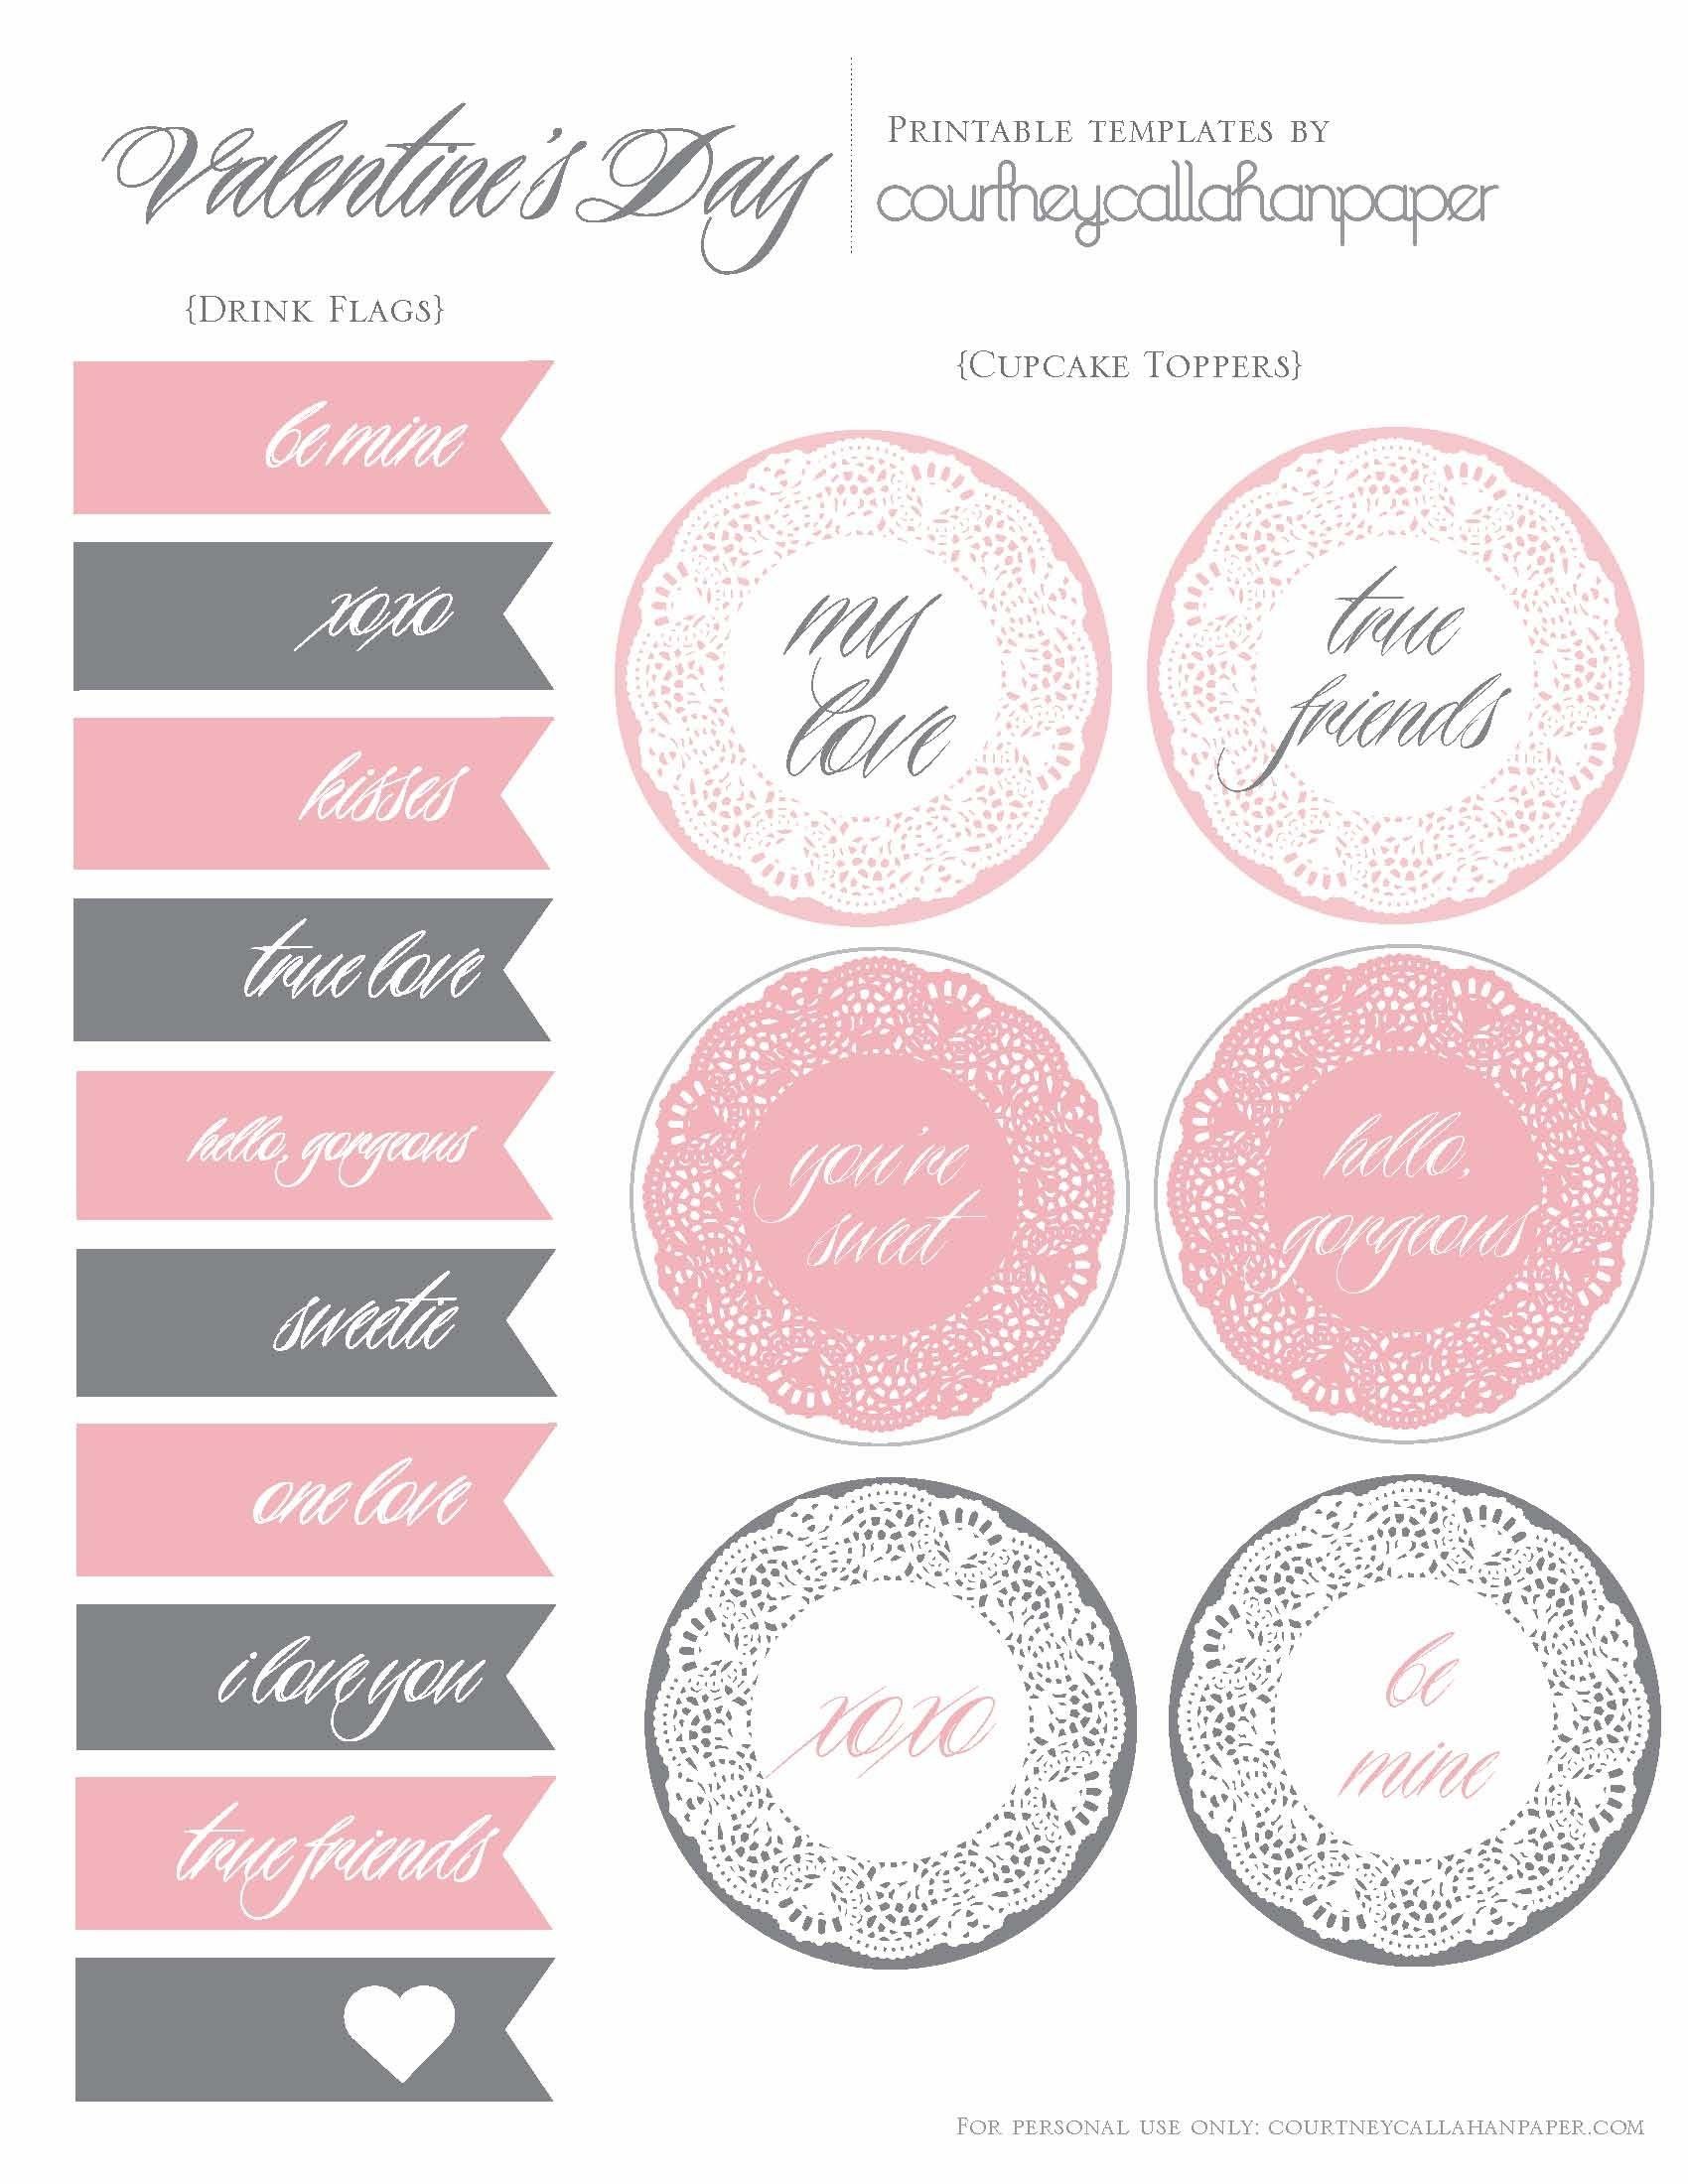 Free Printable Wedding Cupcake Toppers - Google Search | Party Time - Free Printable Whale Cupcake Toppers